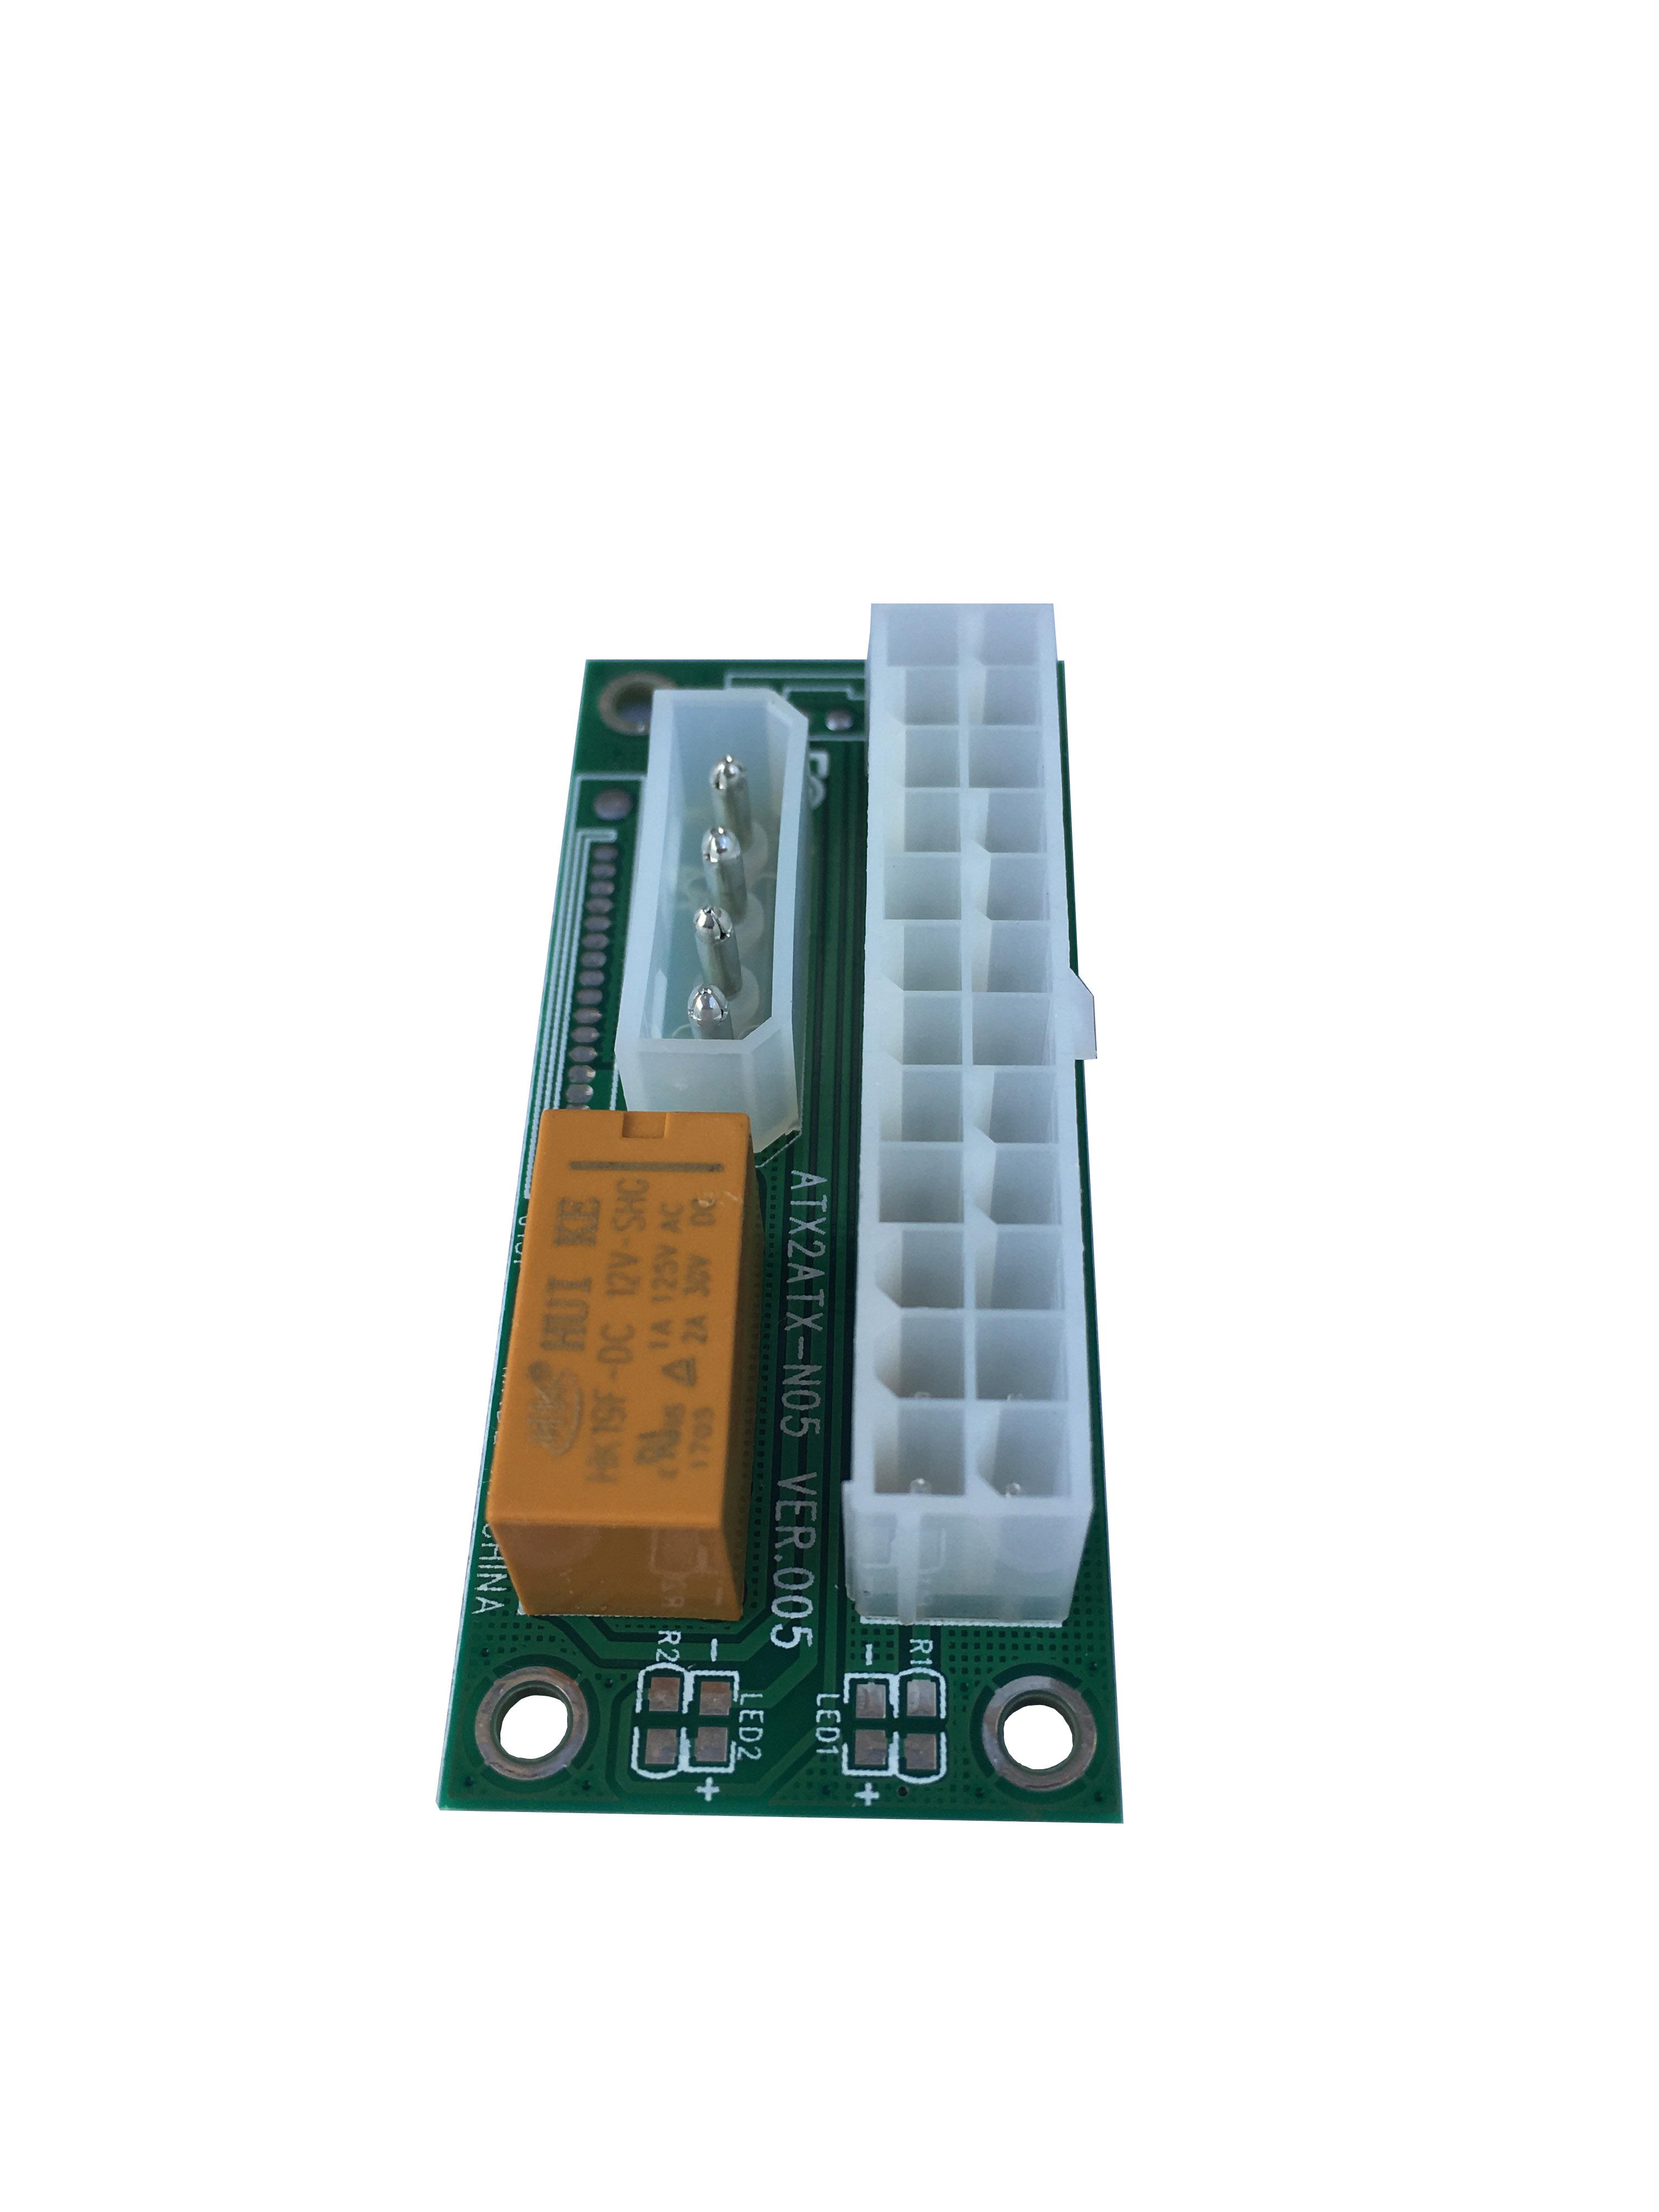 Add2psu Dual Psu Adapter Card 24 Pin Power Supply For 2 12v